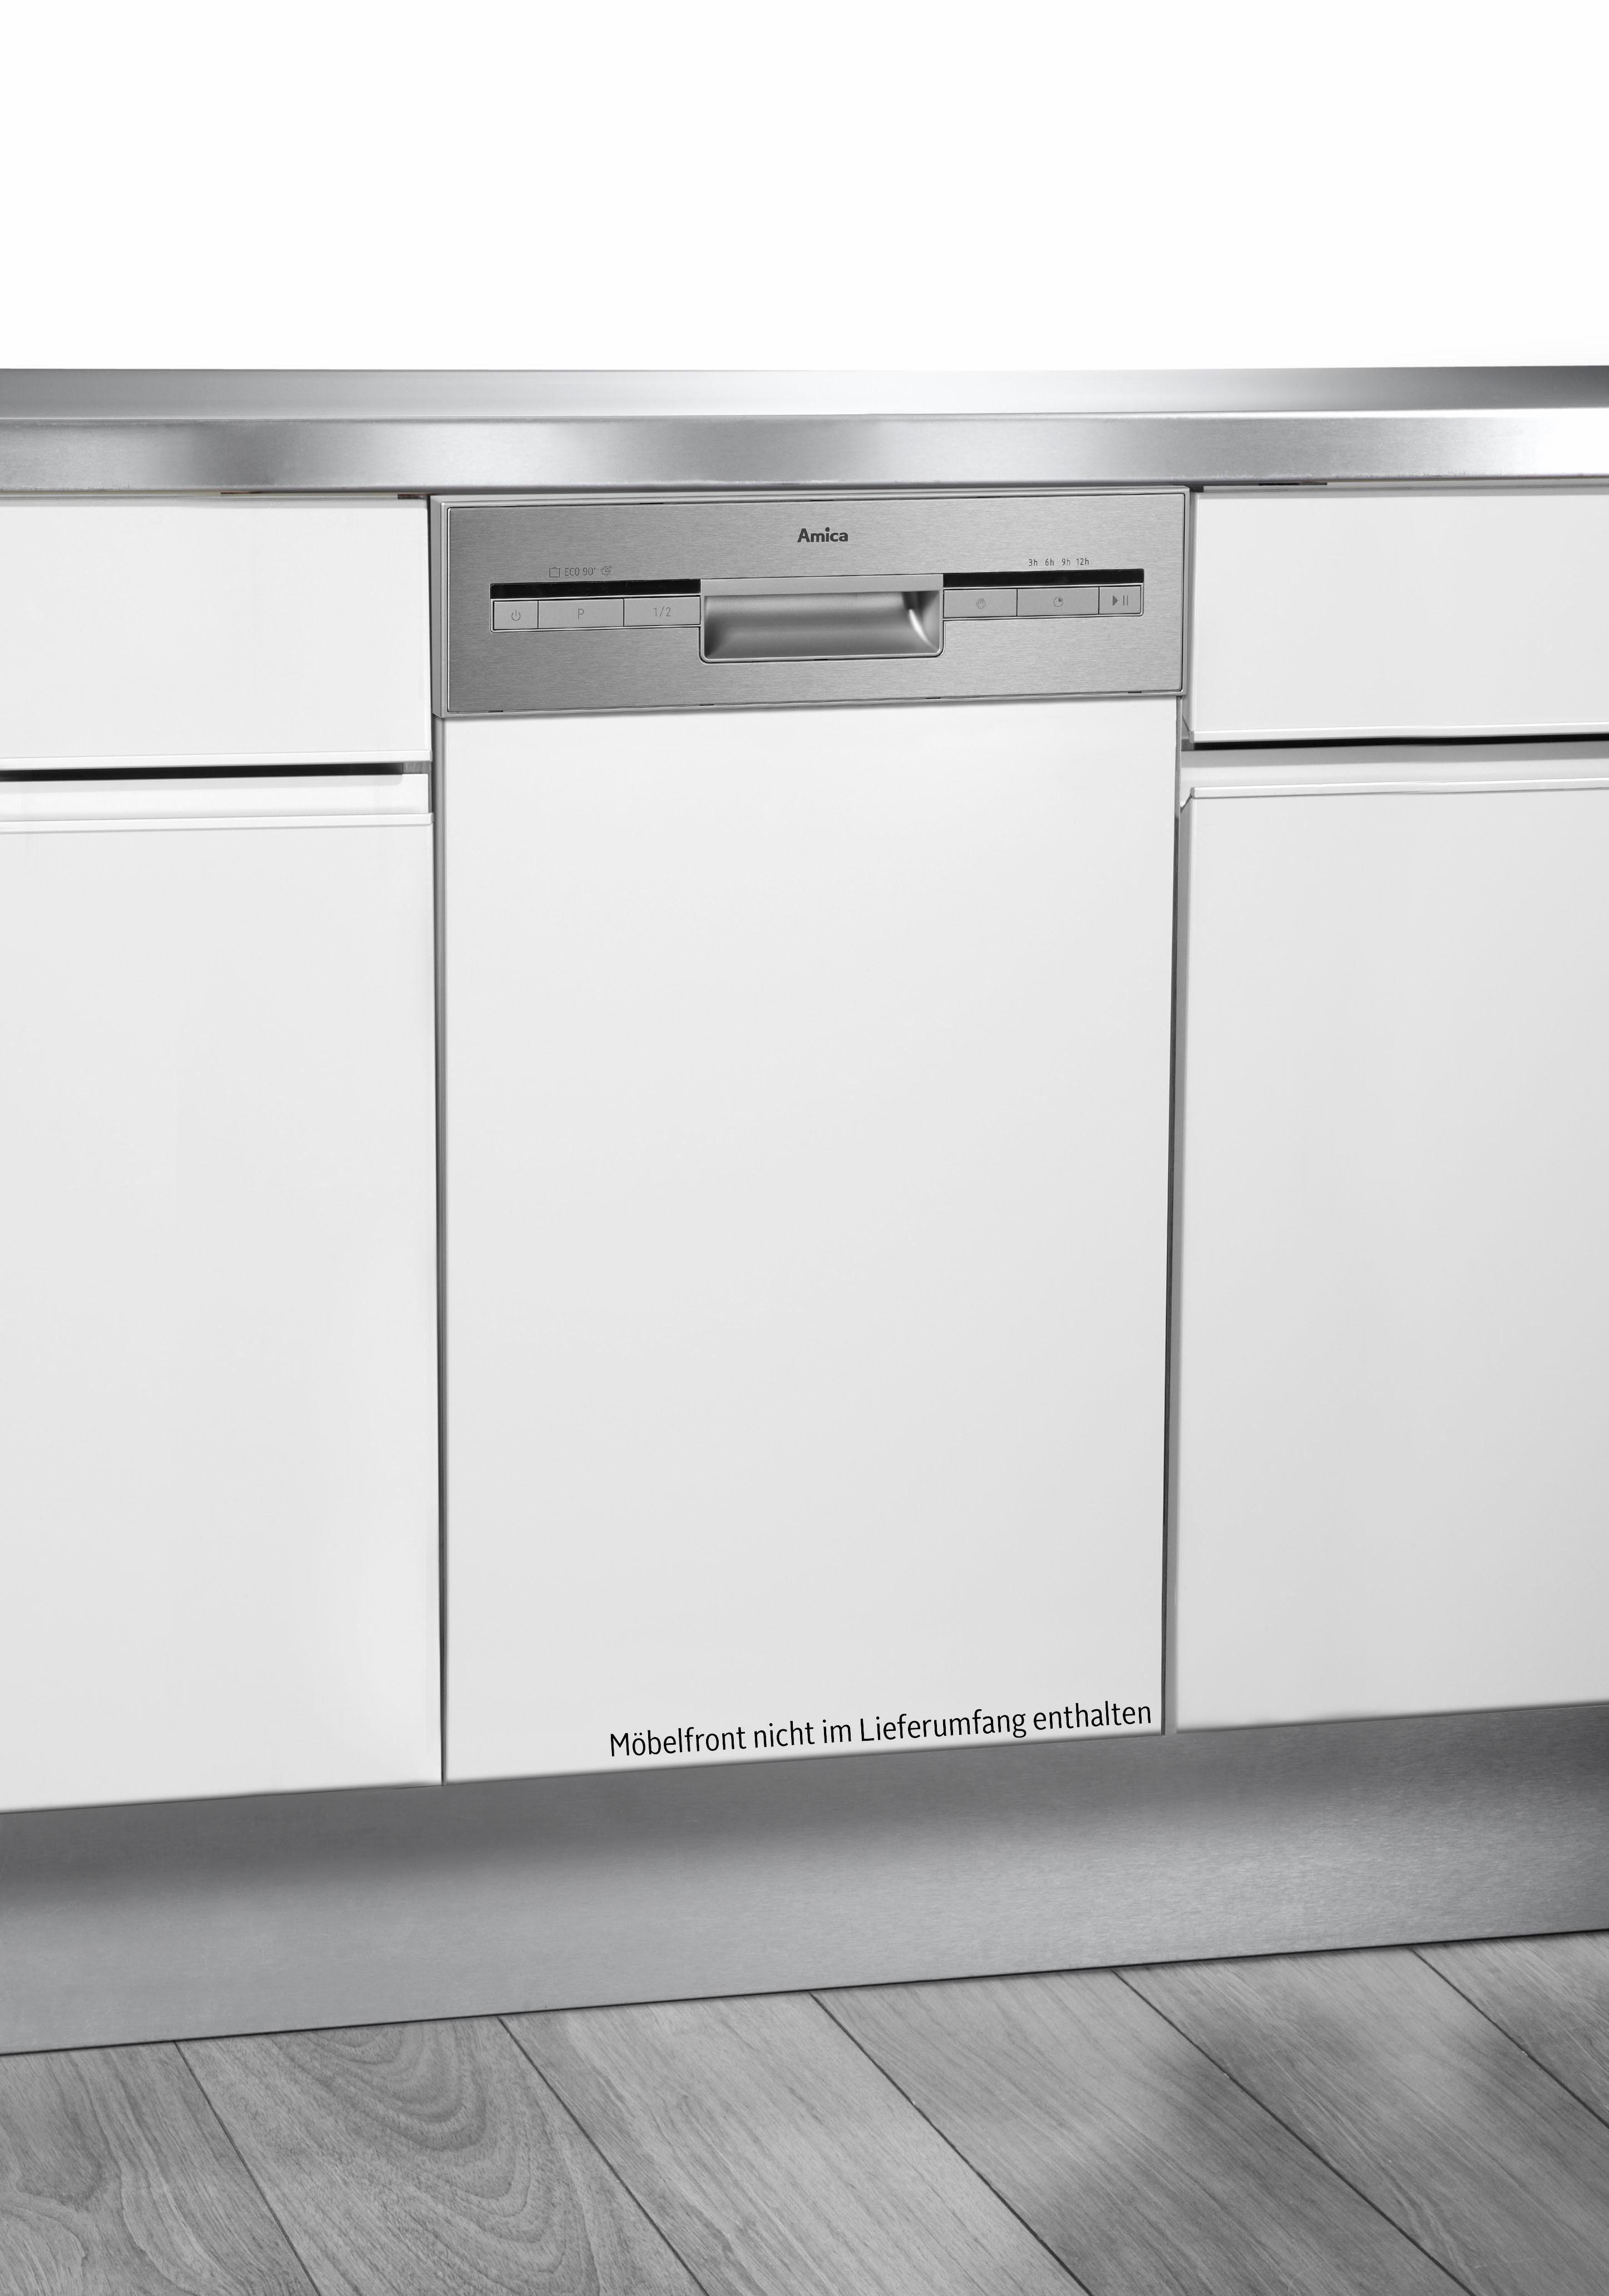 Amica teilintegrierbarer Geschirrspüler, EGSP 14695 E, 9,5 l, 9 Maßgedecke, 45 cm breit